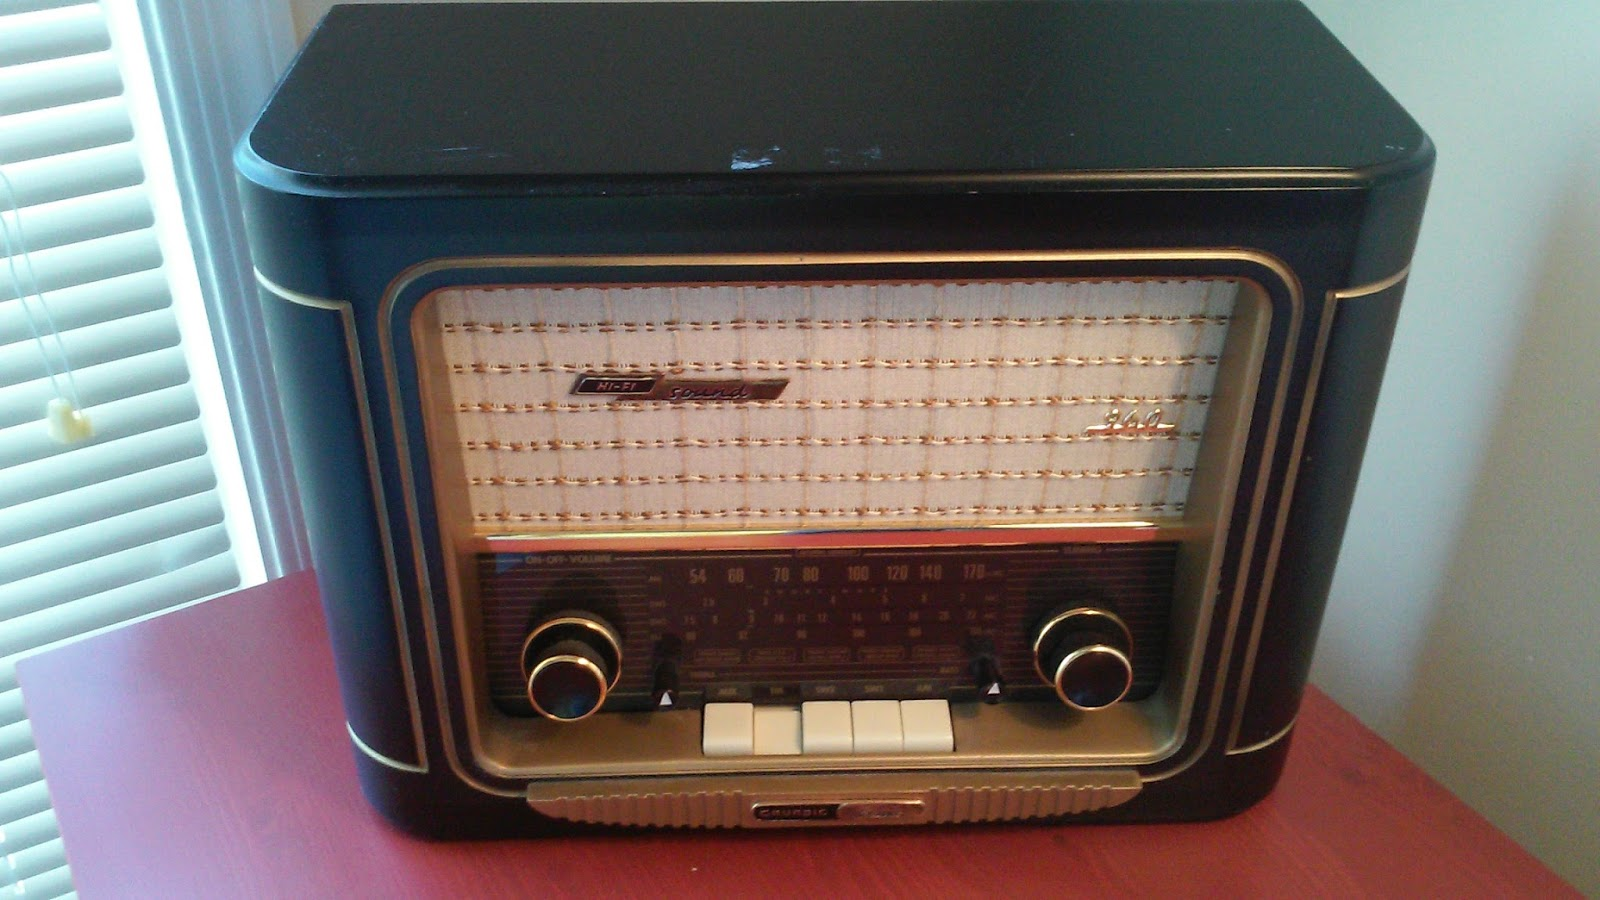 Dirt Cheap Audio Blog: Audio Review: Grundig 960 Classic AM/FM/SW Radio